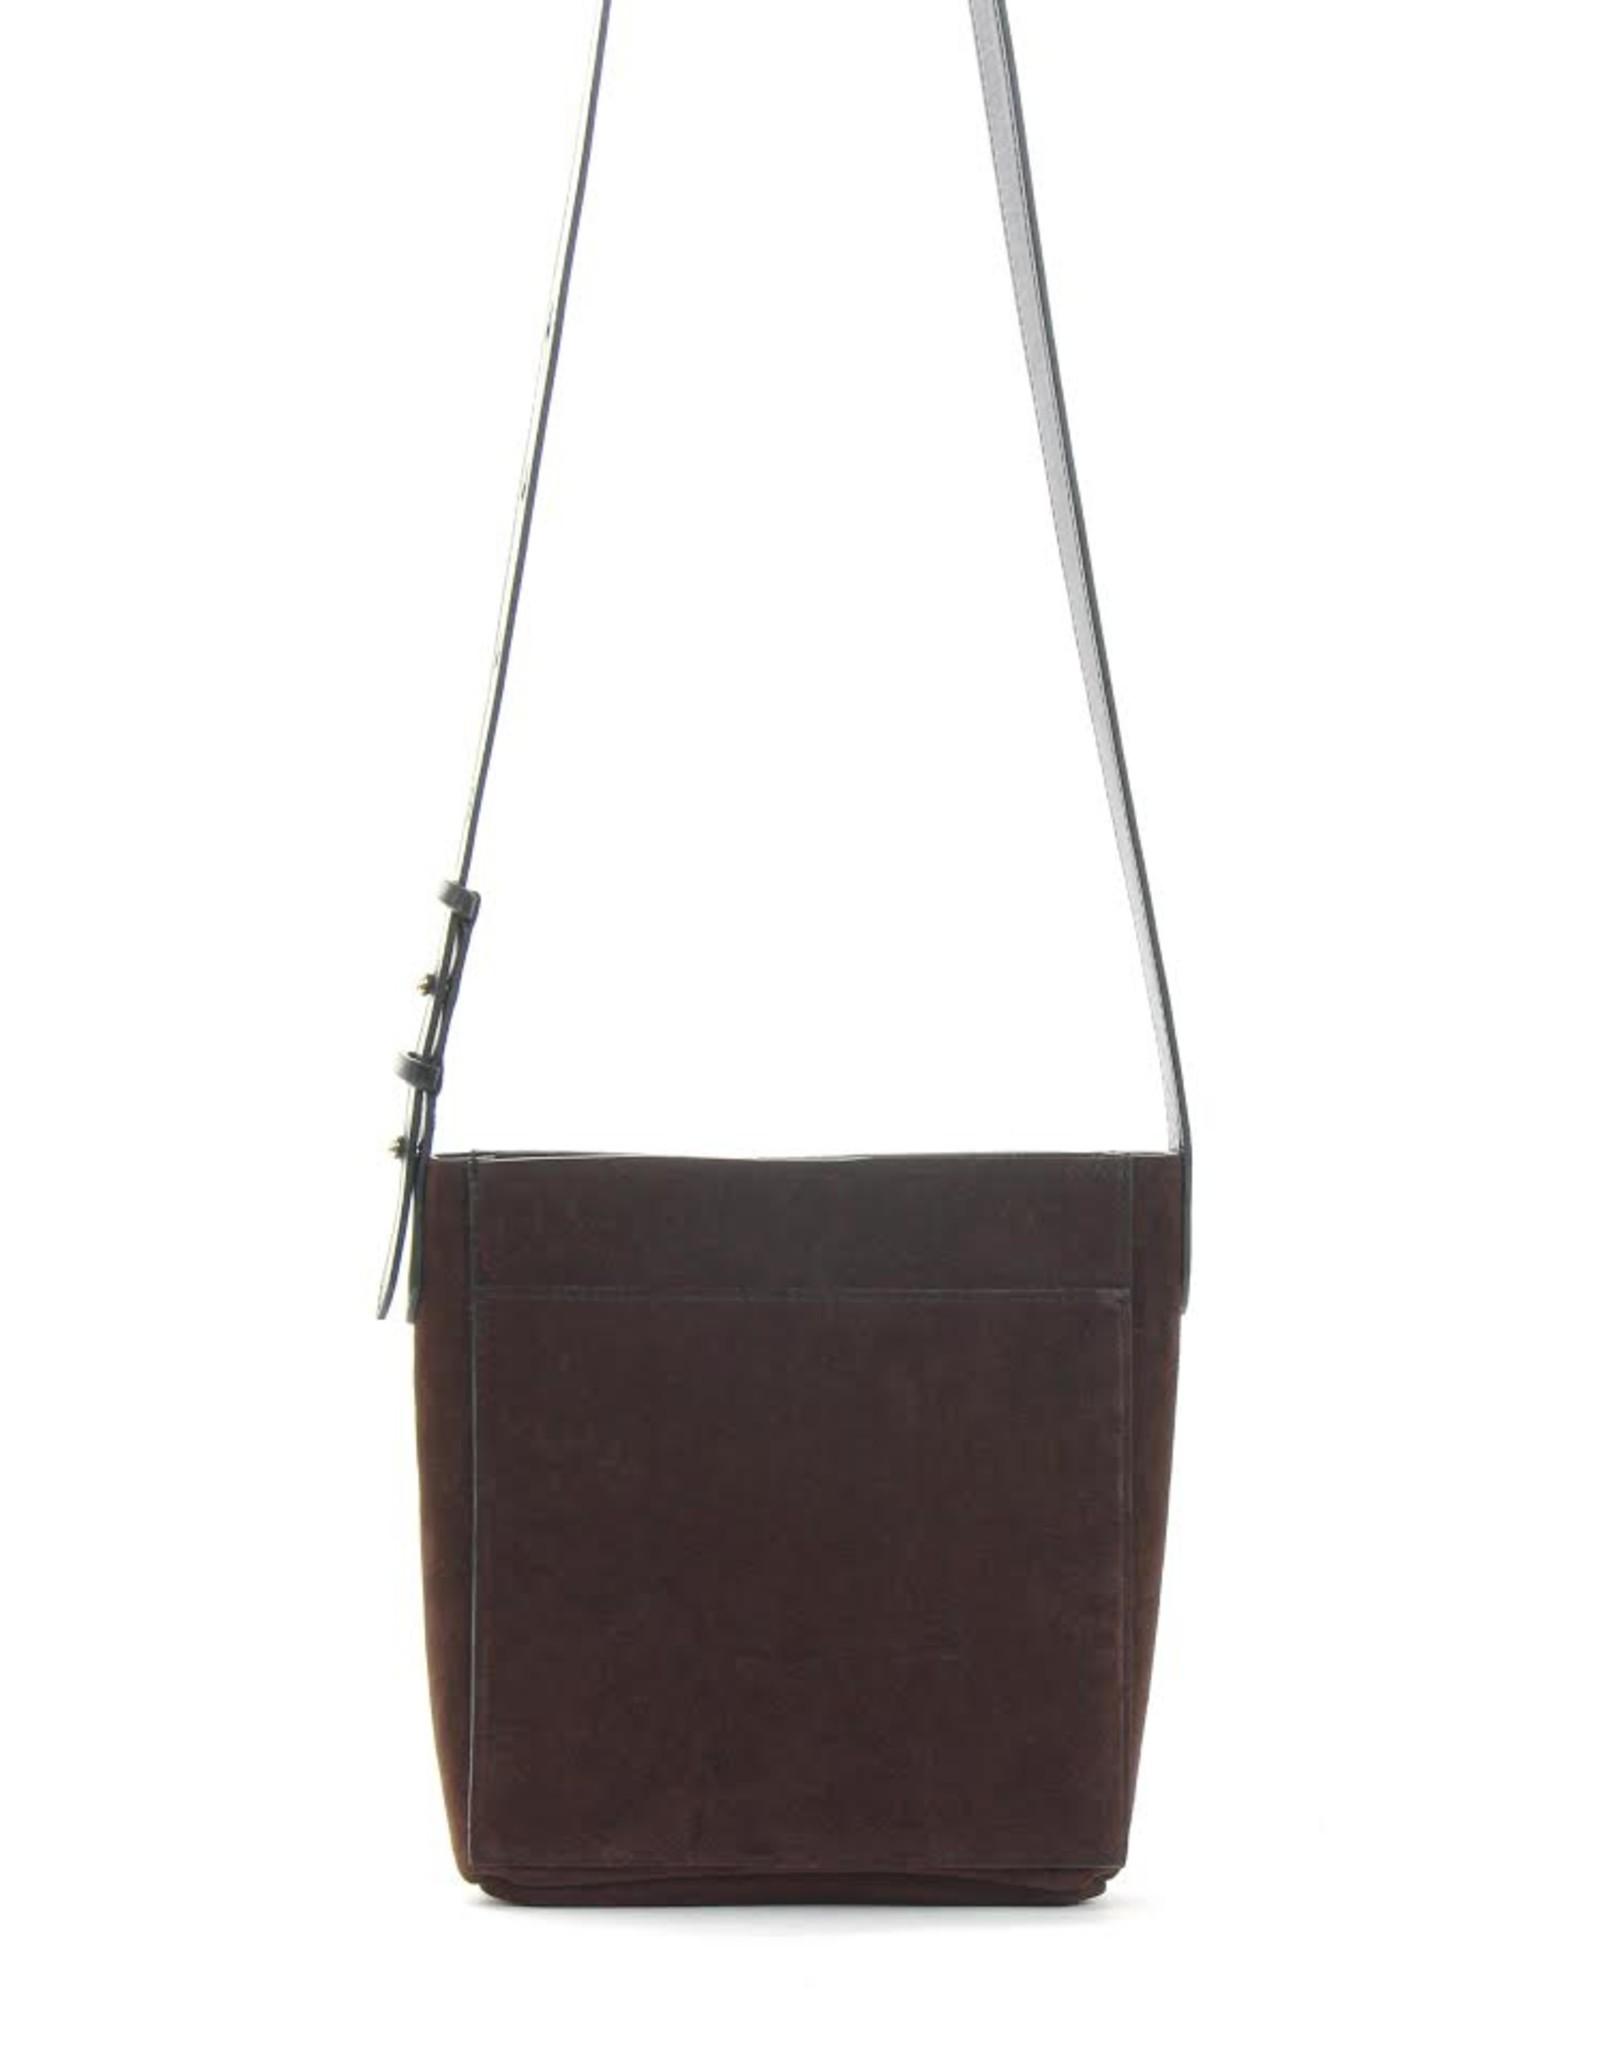 B.MAY BAGS - Mini Messenger Bag